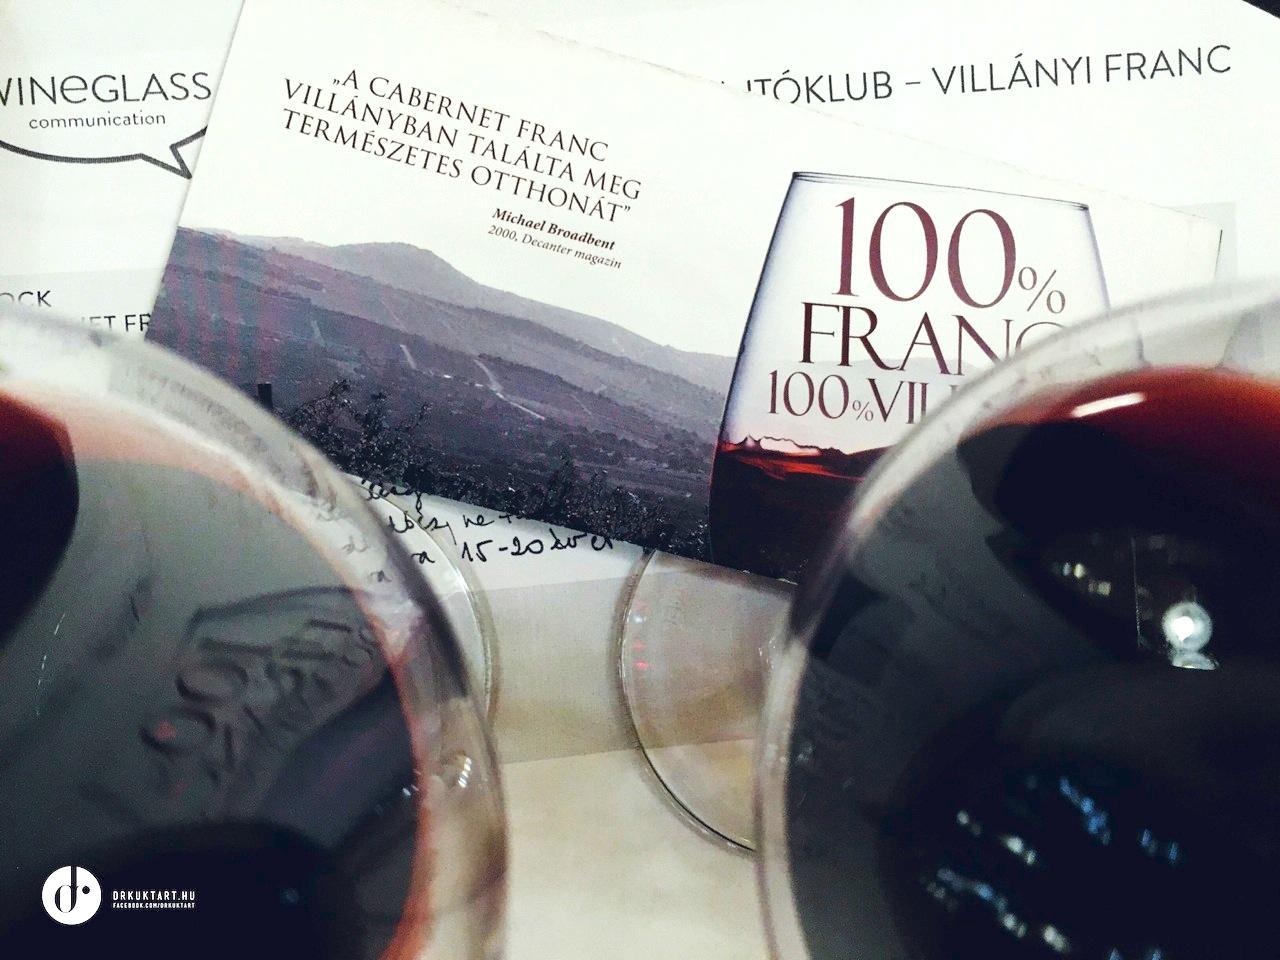 drkuktart_wineglasscommunicationvillanyifranccabernetfrancgerevylyan01.jpg